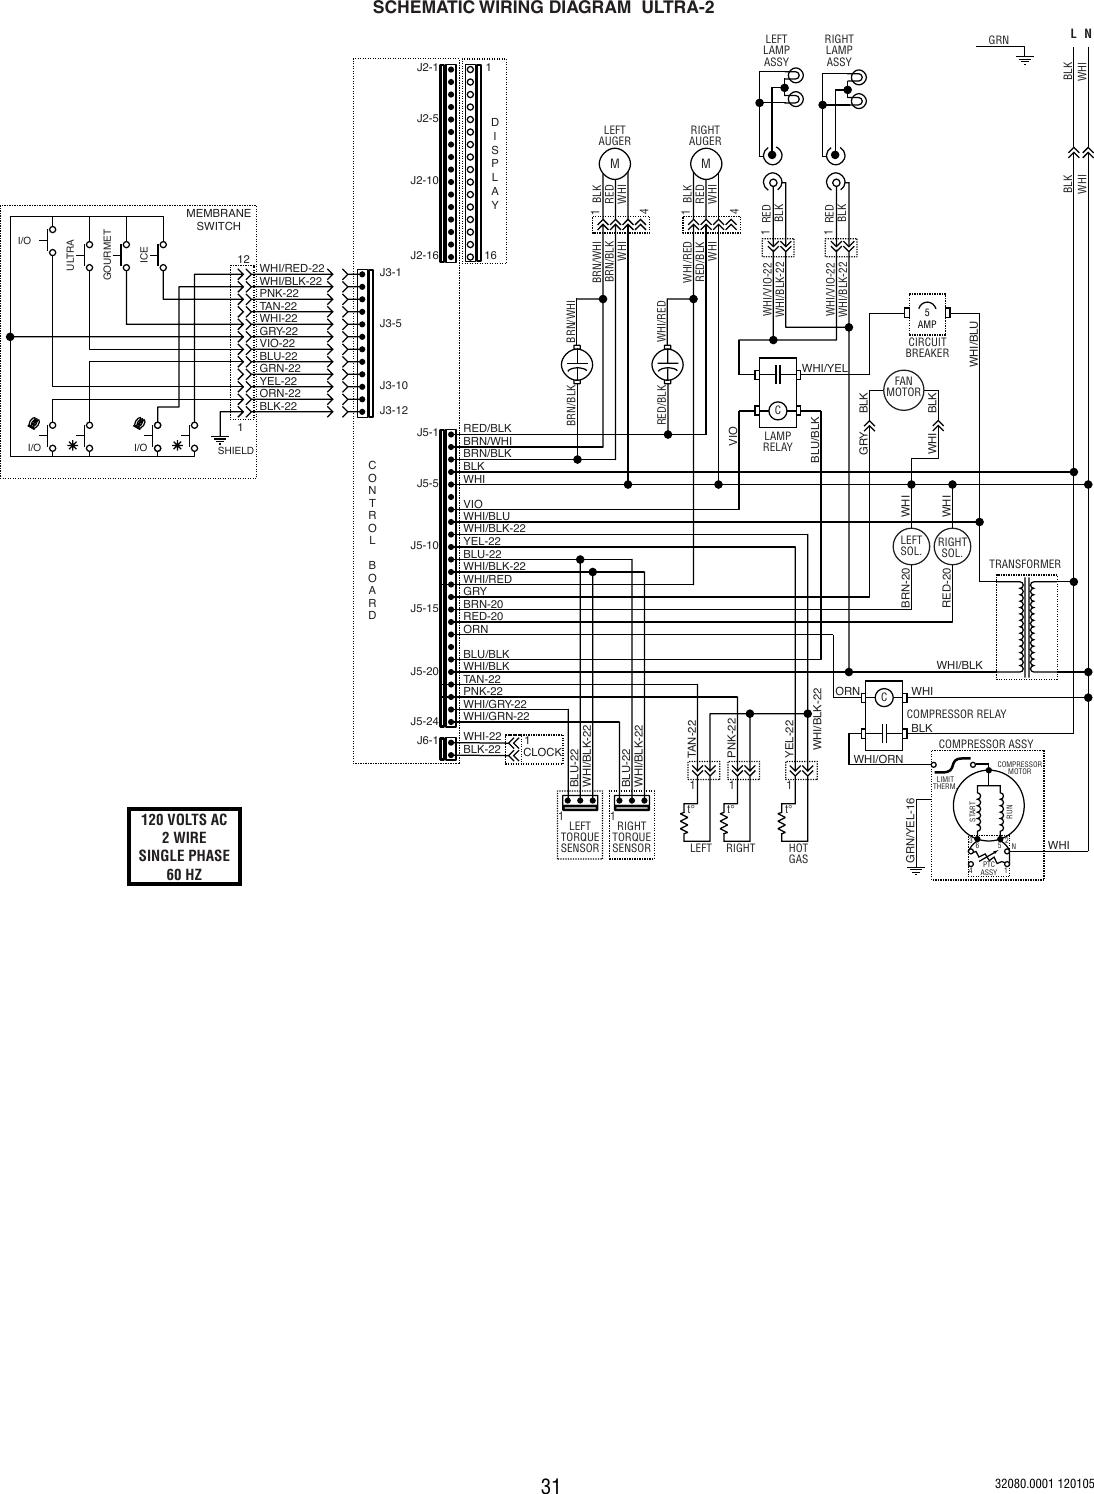 bunn wiring diagram go wiring diagrams Columbia Wiring Diagram bunn single wiring diagram read all wiring diagram bunn wiring diagram bunn wiring diagram